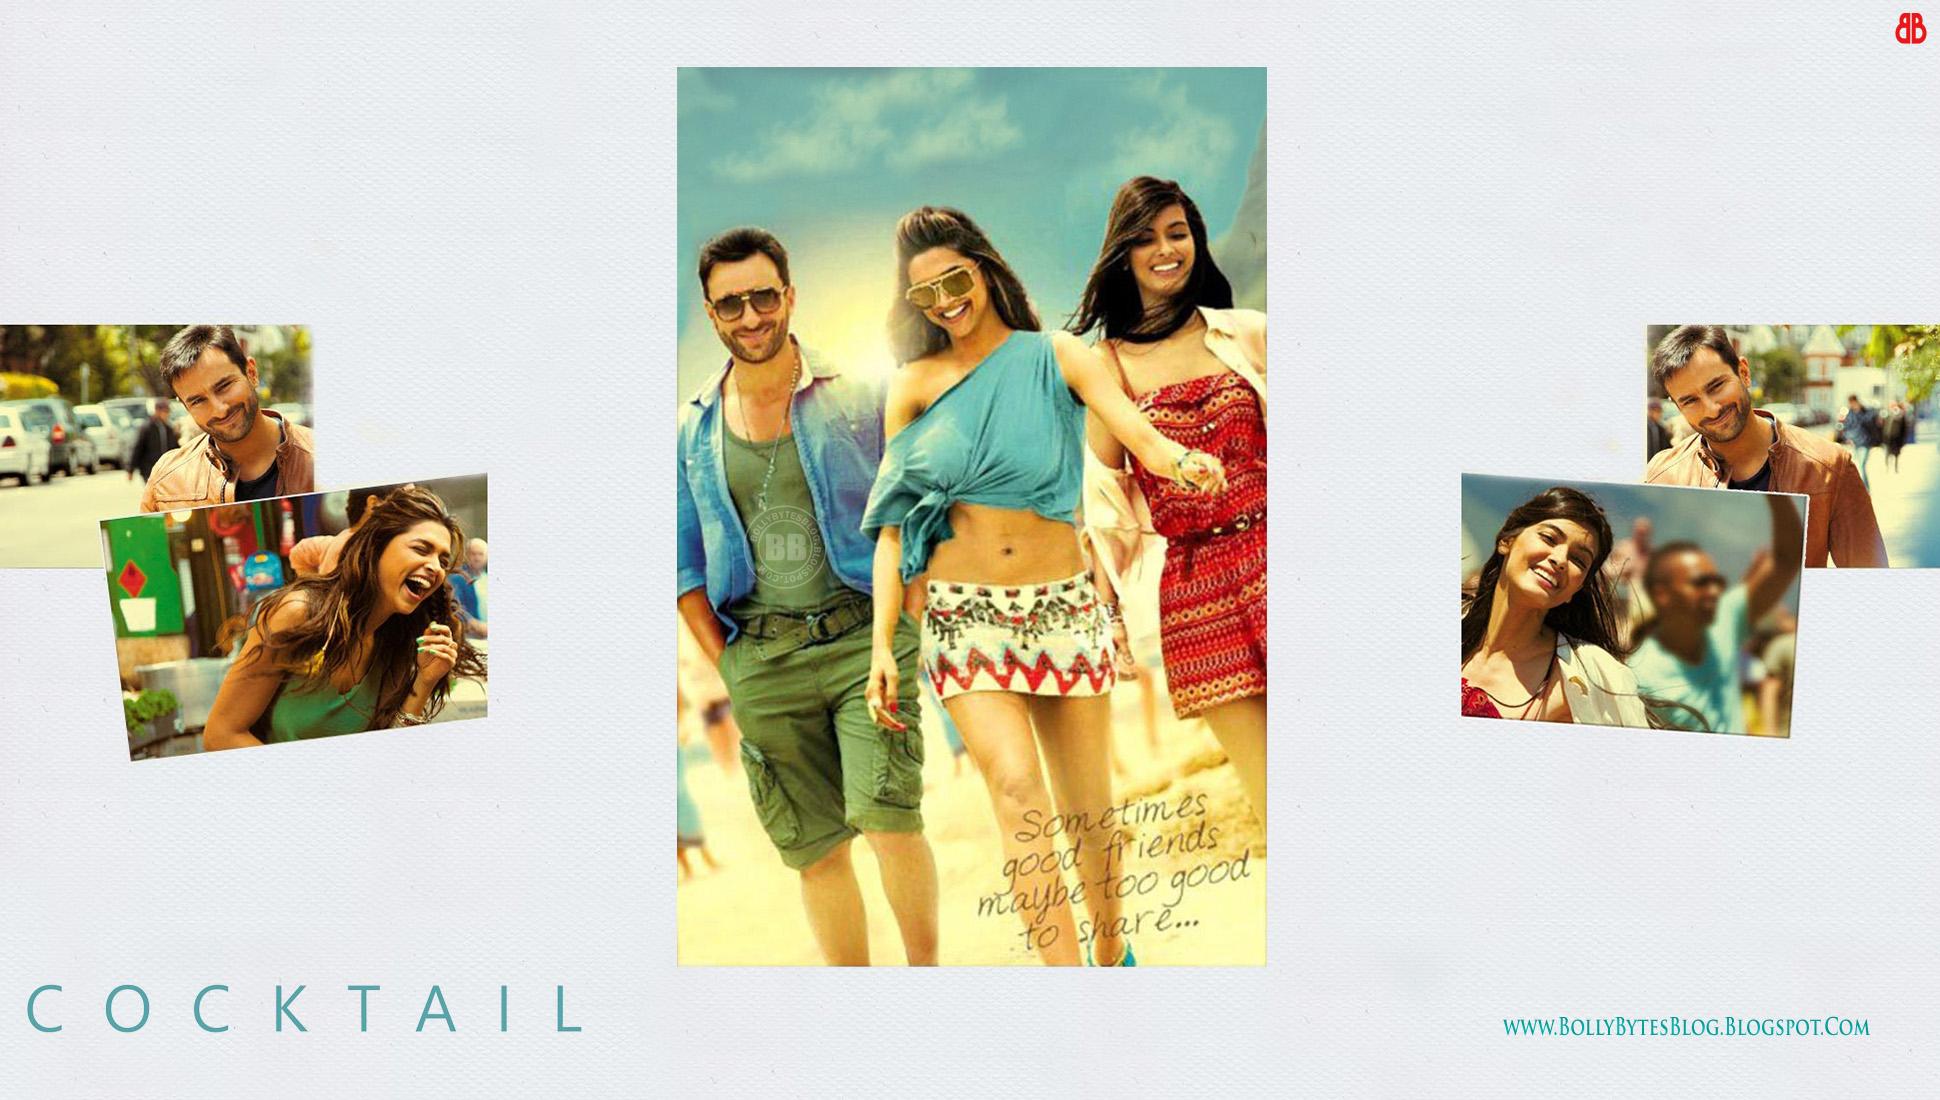 Wallpapers - starring Saif Ali Khan, Deepika Padukone and Diana Penty